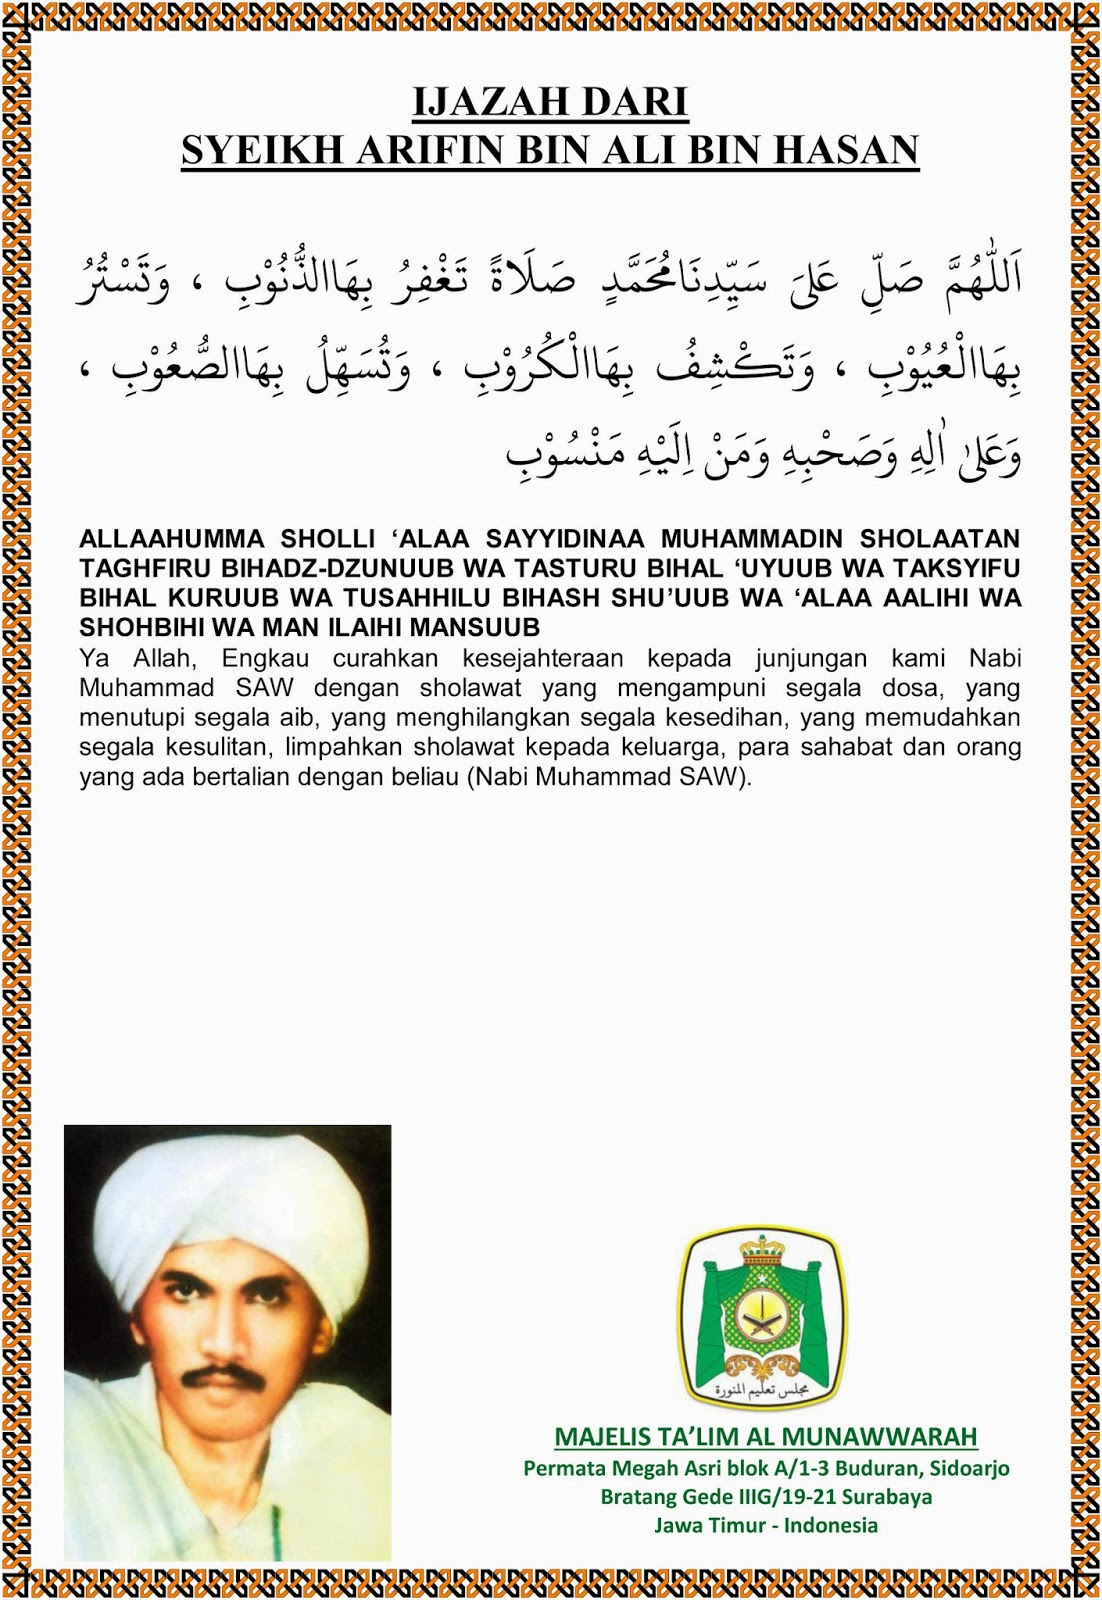 Ijazah Dari Syeikh Arifin Bin Ali Bin Hasan Majelis Talim